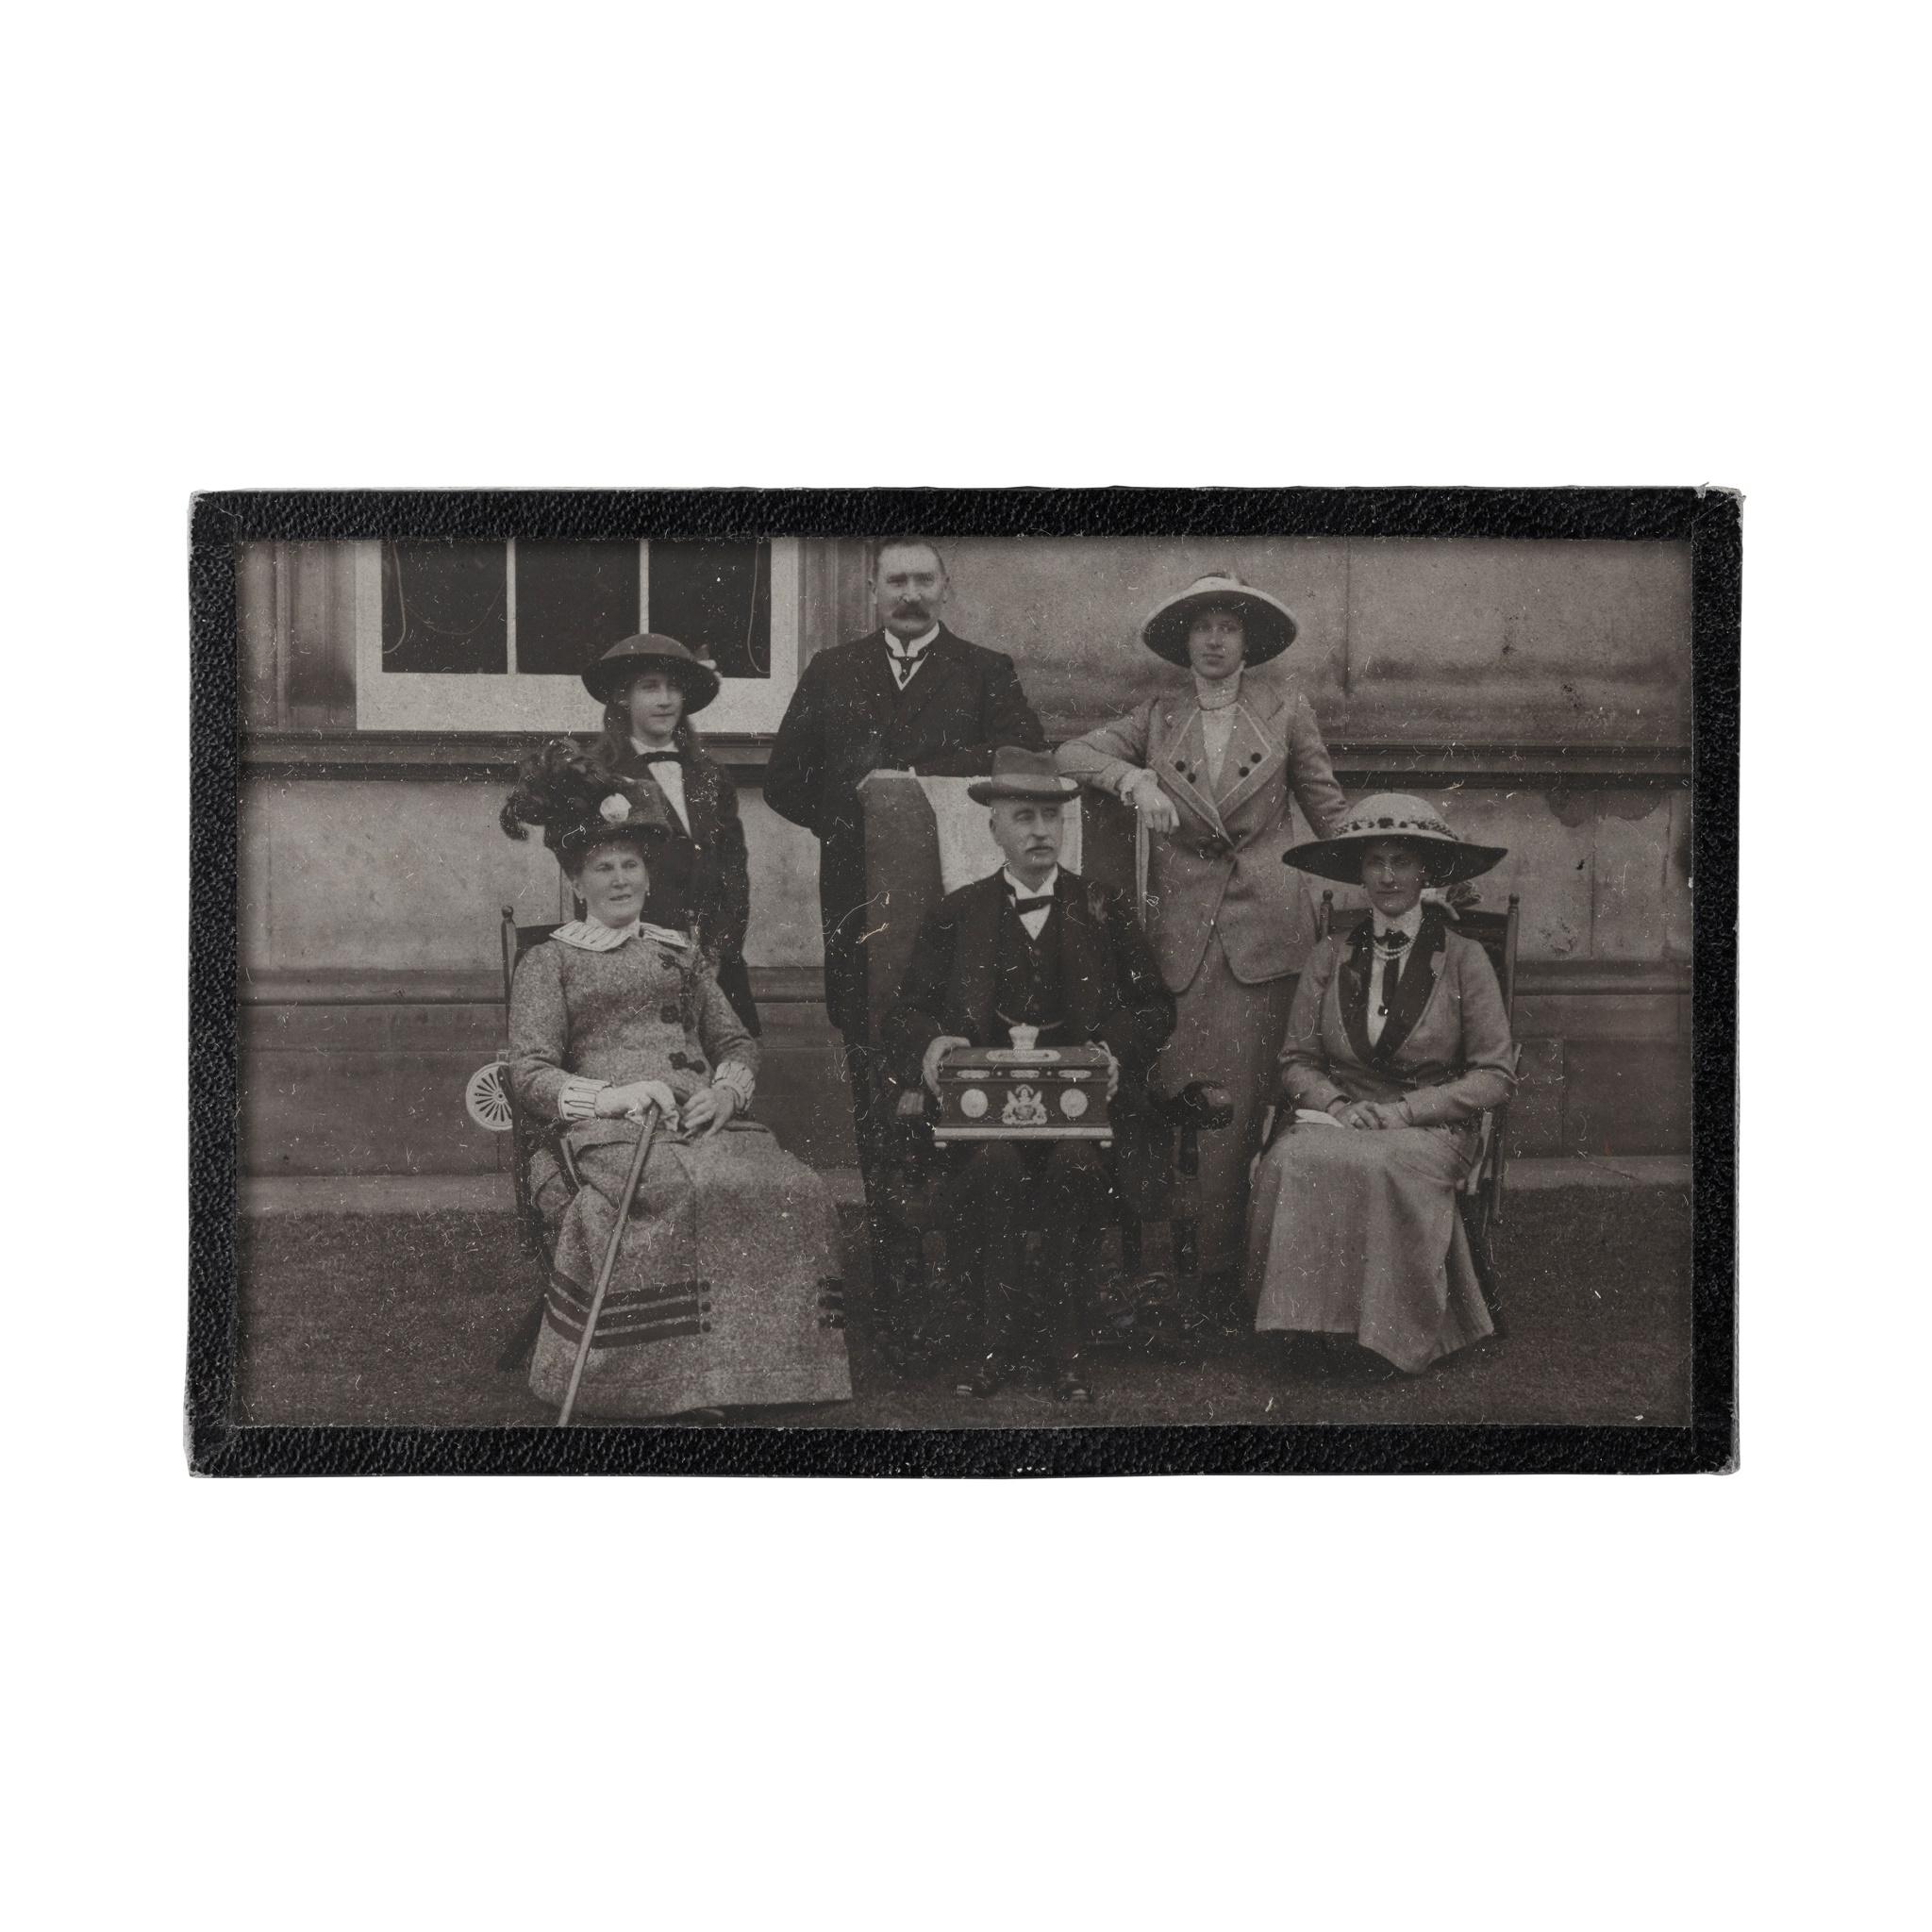 A GEORGE V DUCAL PRESENTATION BOX WILLIAM HAMILTON & SONS, EDINBURGH 1911 - Image 6 of 6